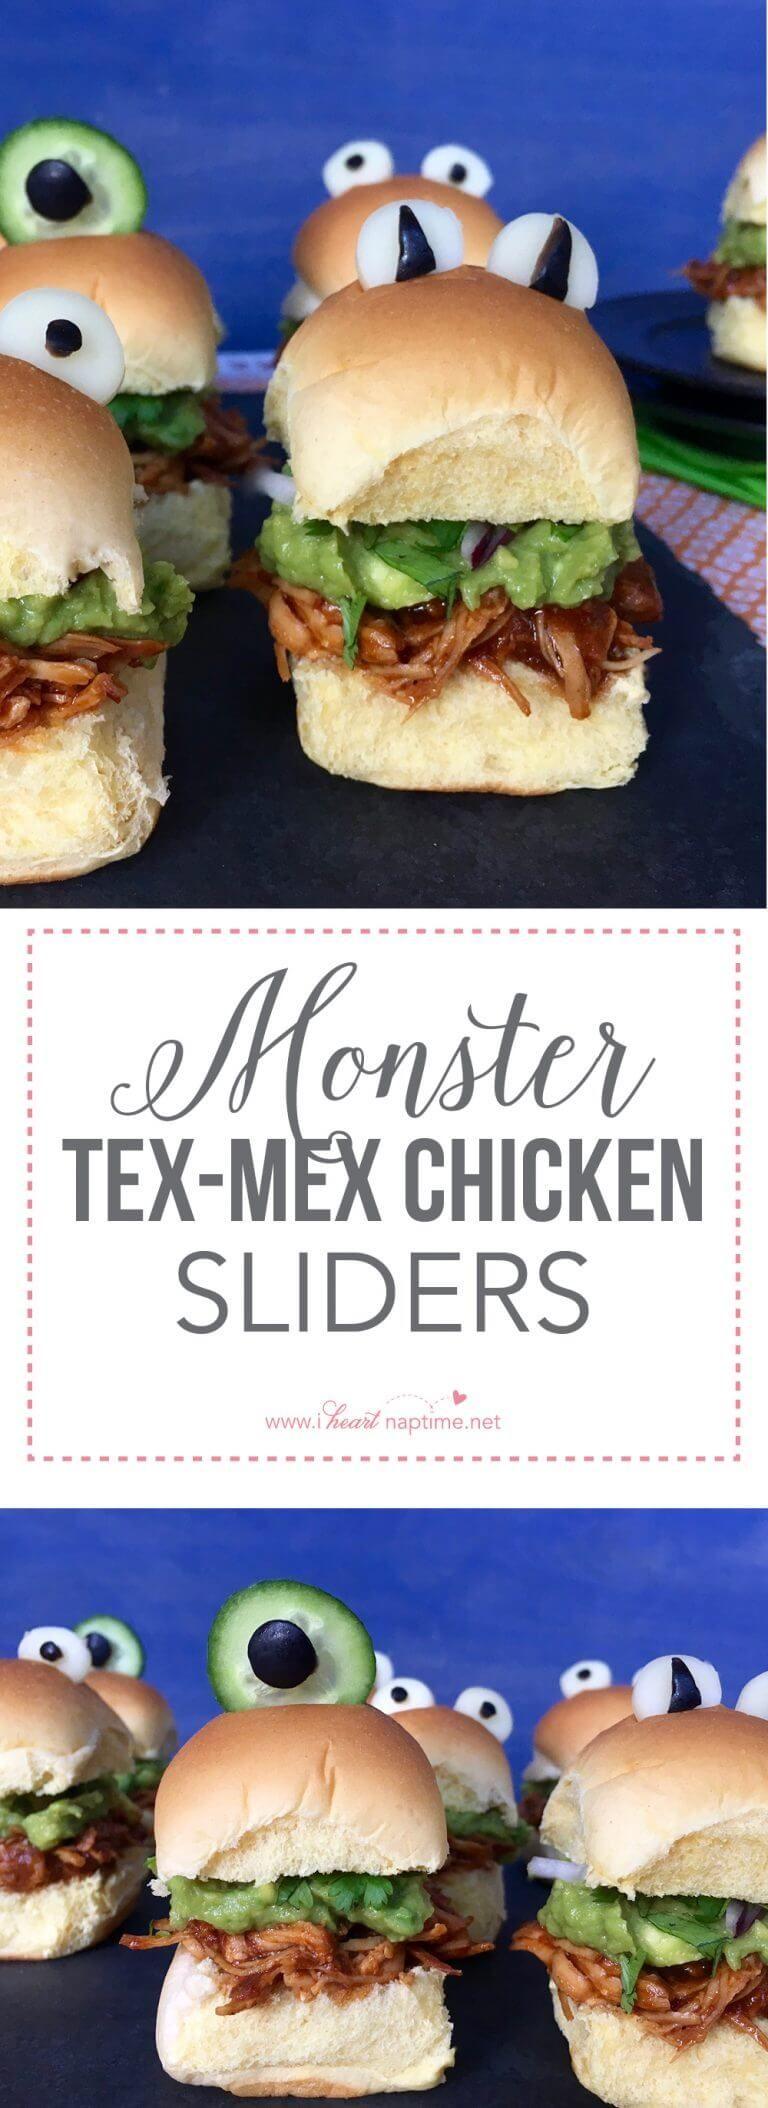 Monster Tex-Mex Chicken Sliders #halloweenpotluckideas